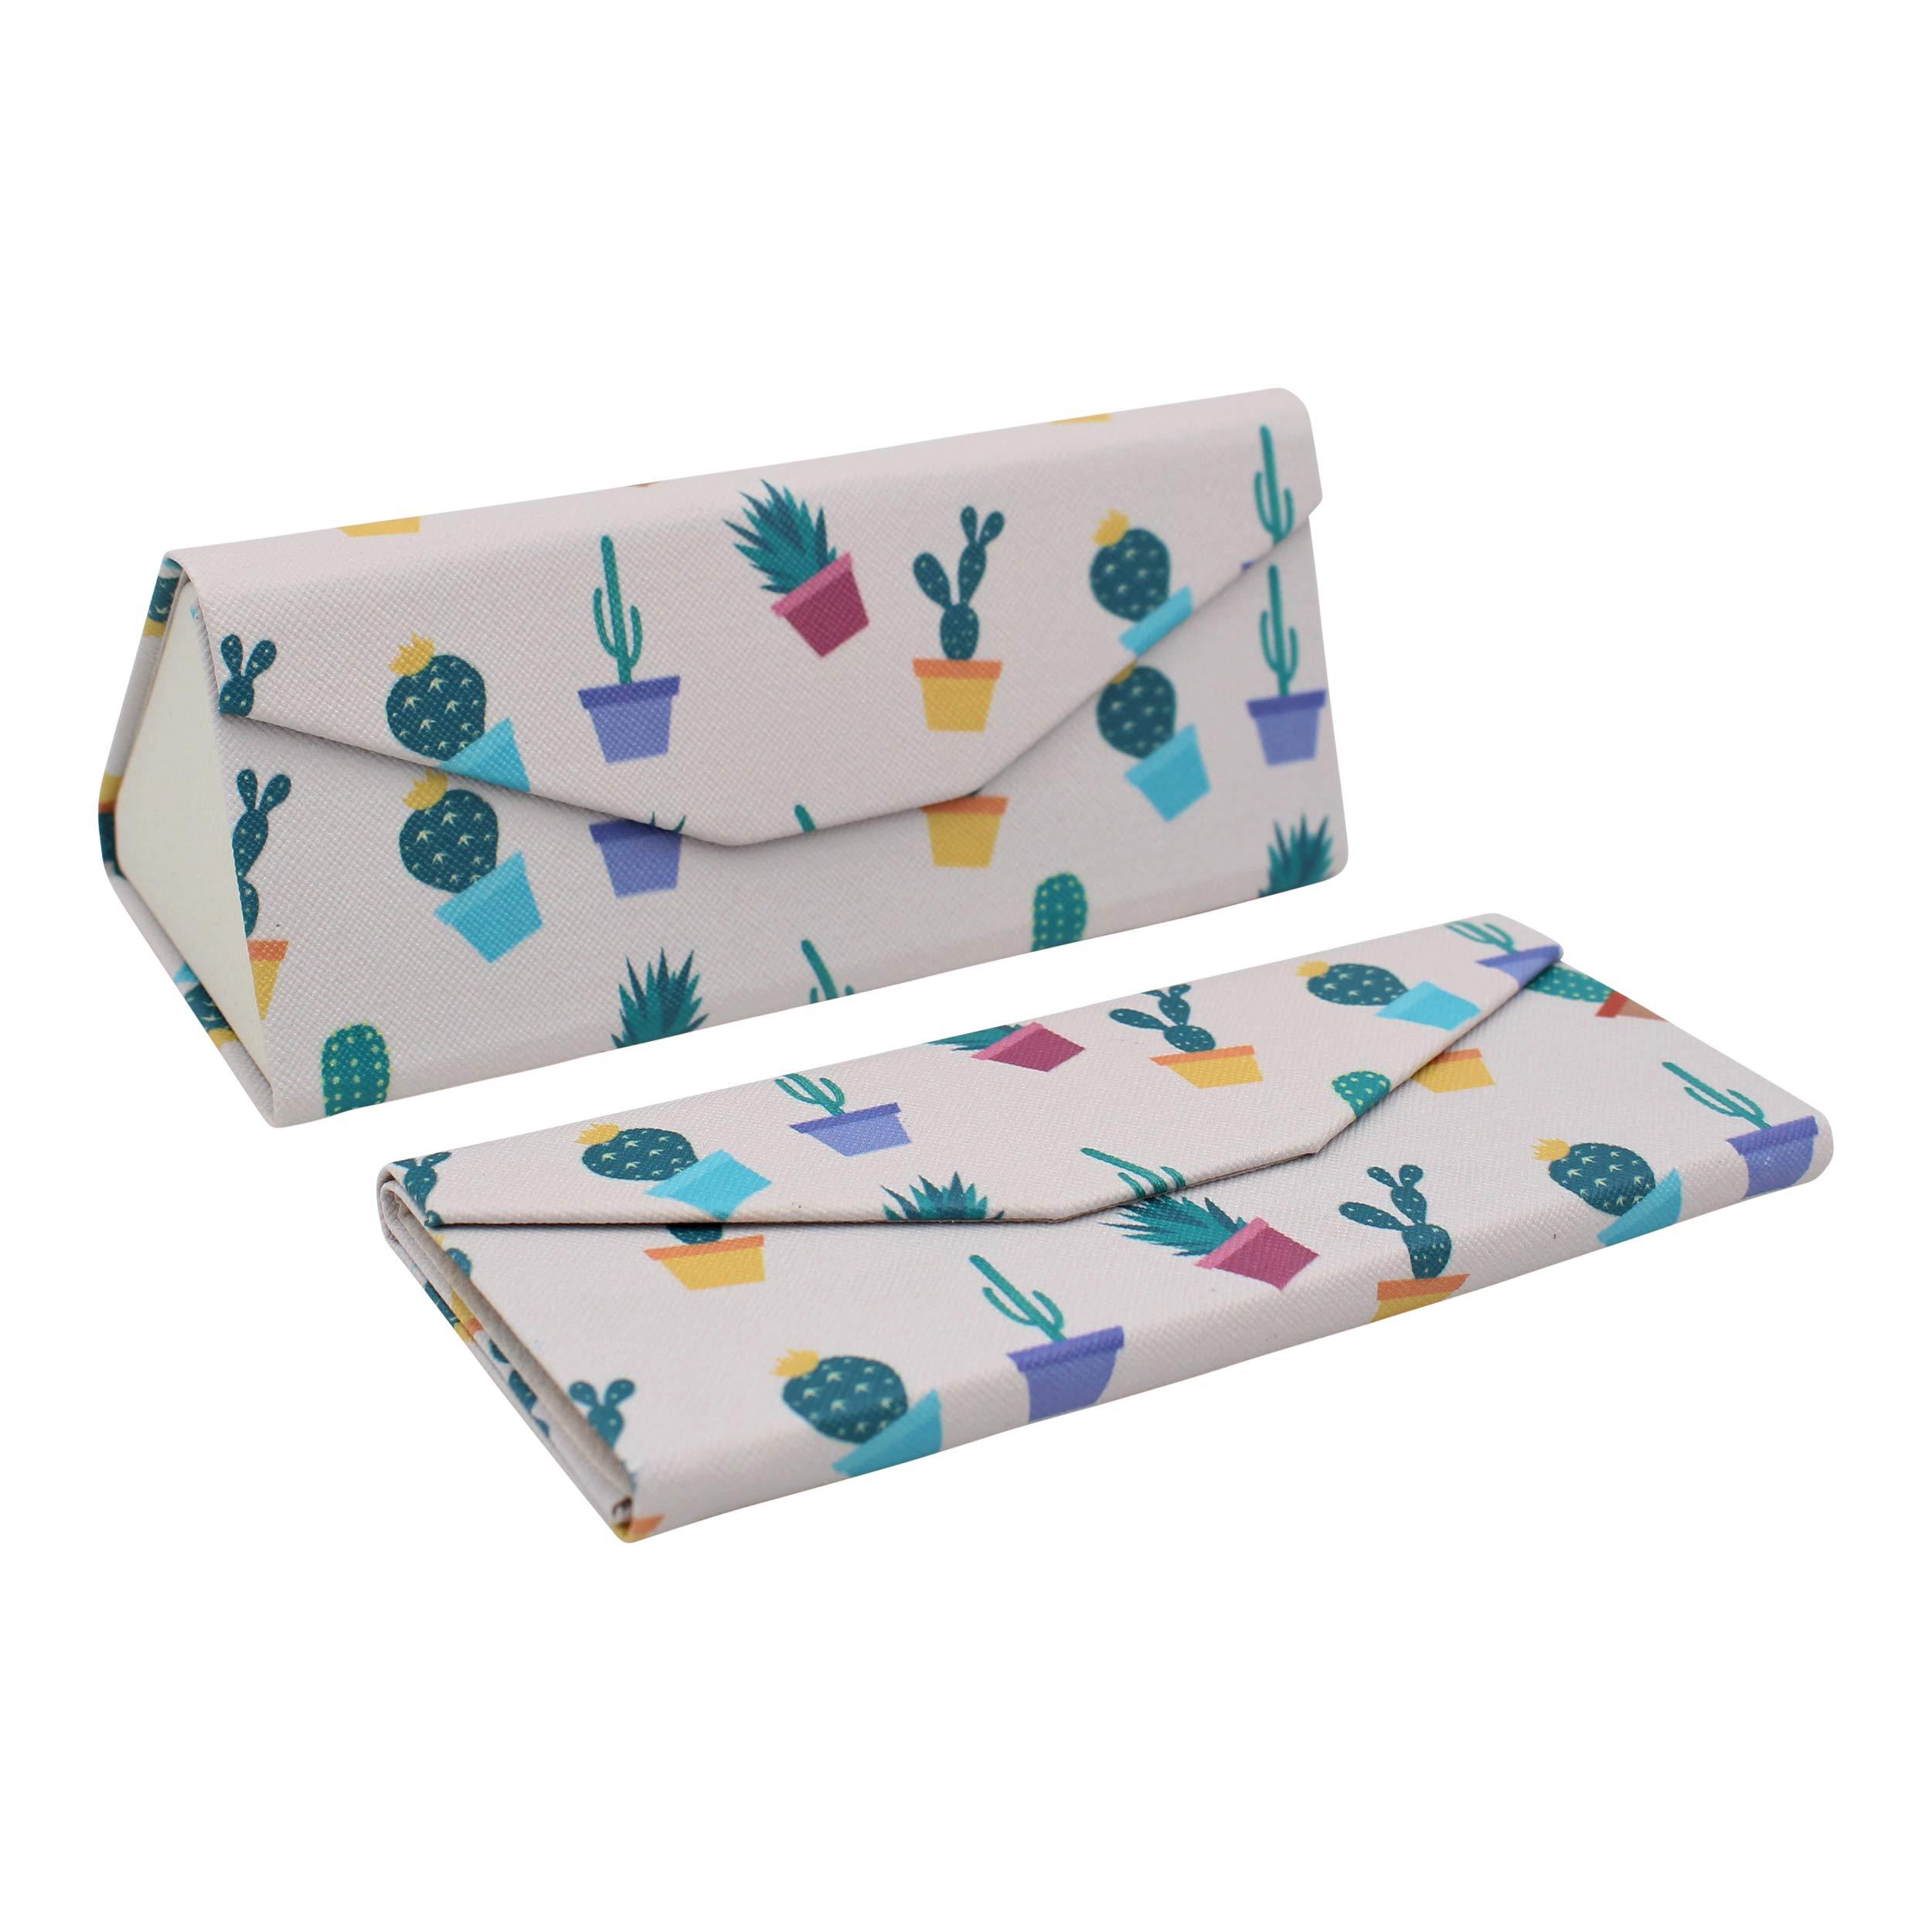 REAL SIC Cactus Glasses Case - Eco Leather Magnetic Folding Hard Case - Cute Succulent Theme Designer Foldable Case for Eyeglasses, Sunglasses & Reading Glasses (Potted Cactus)